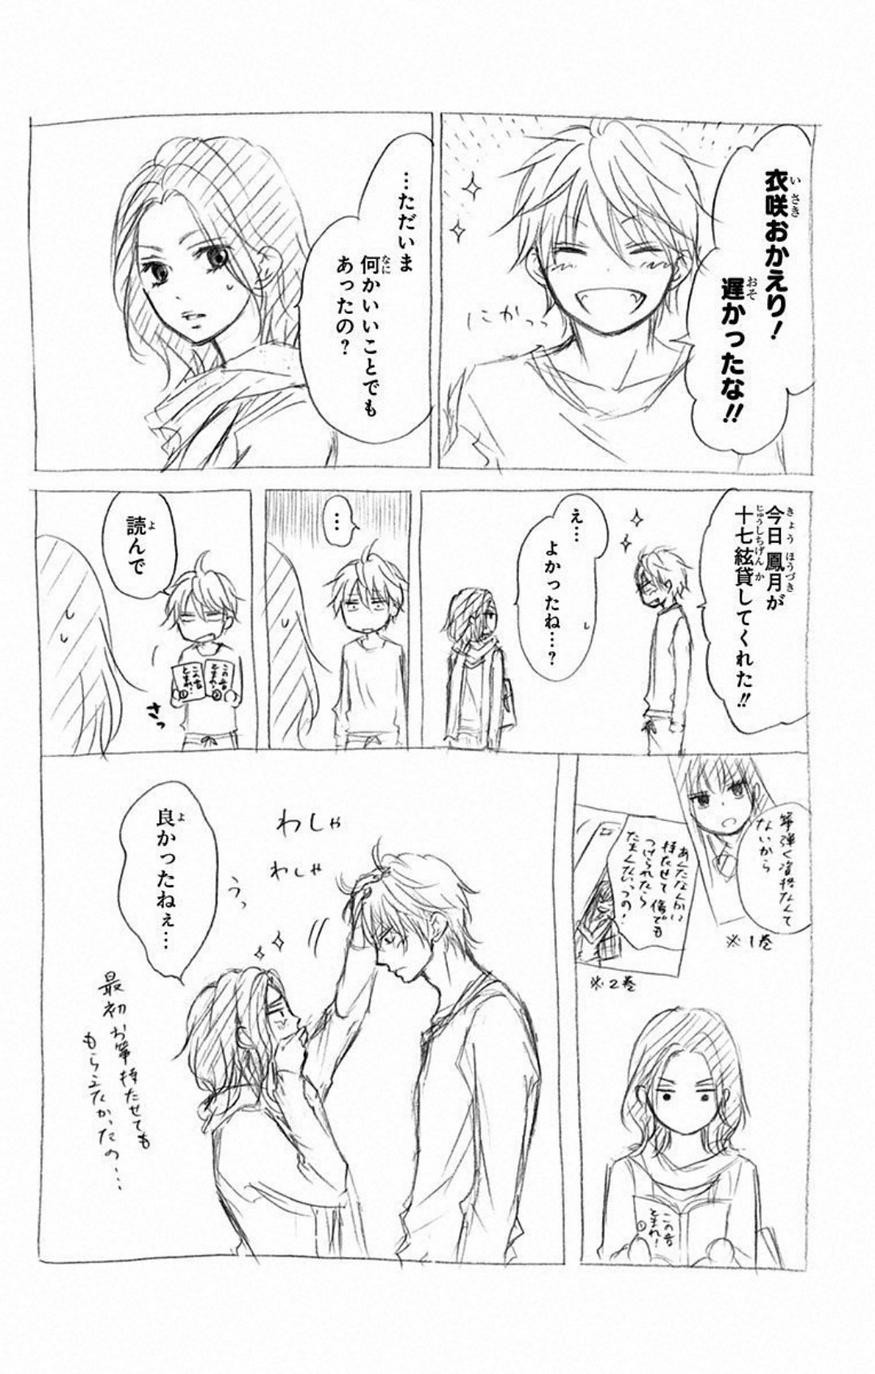 Kono Oto Tomare! - Chapter 33 - Page 46